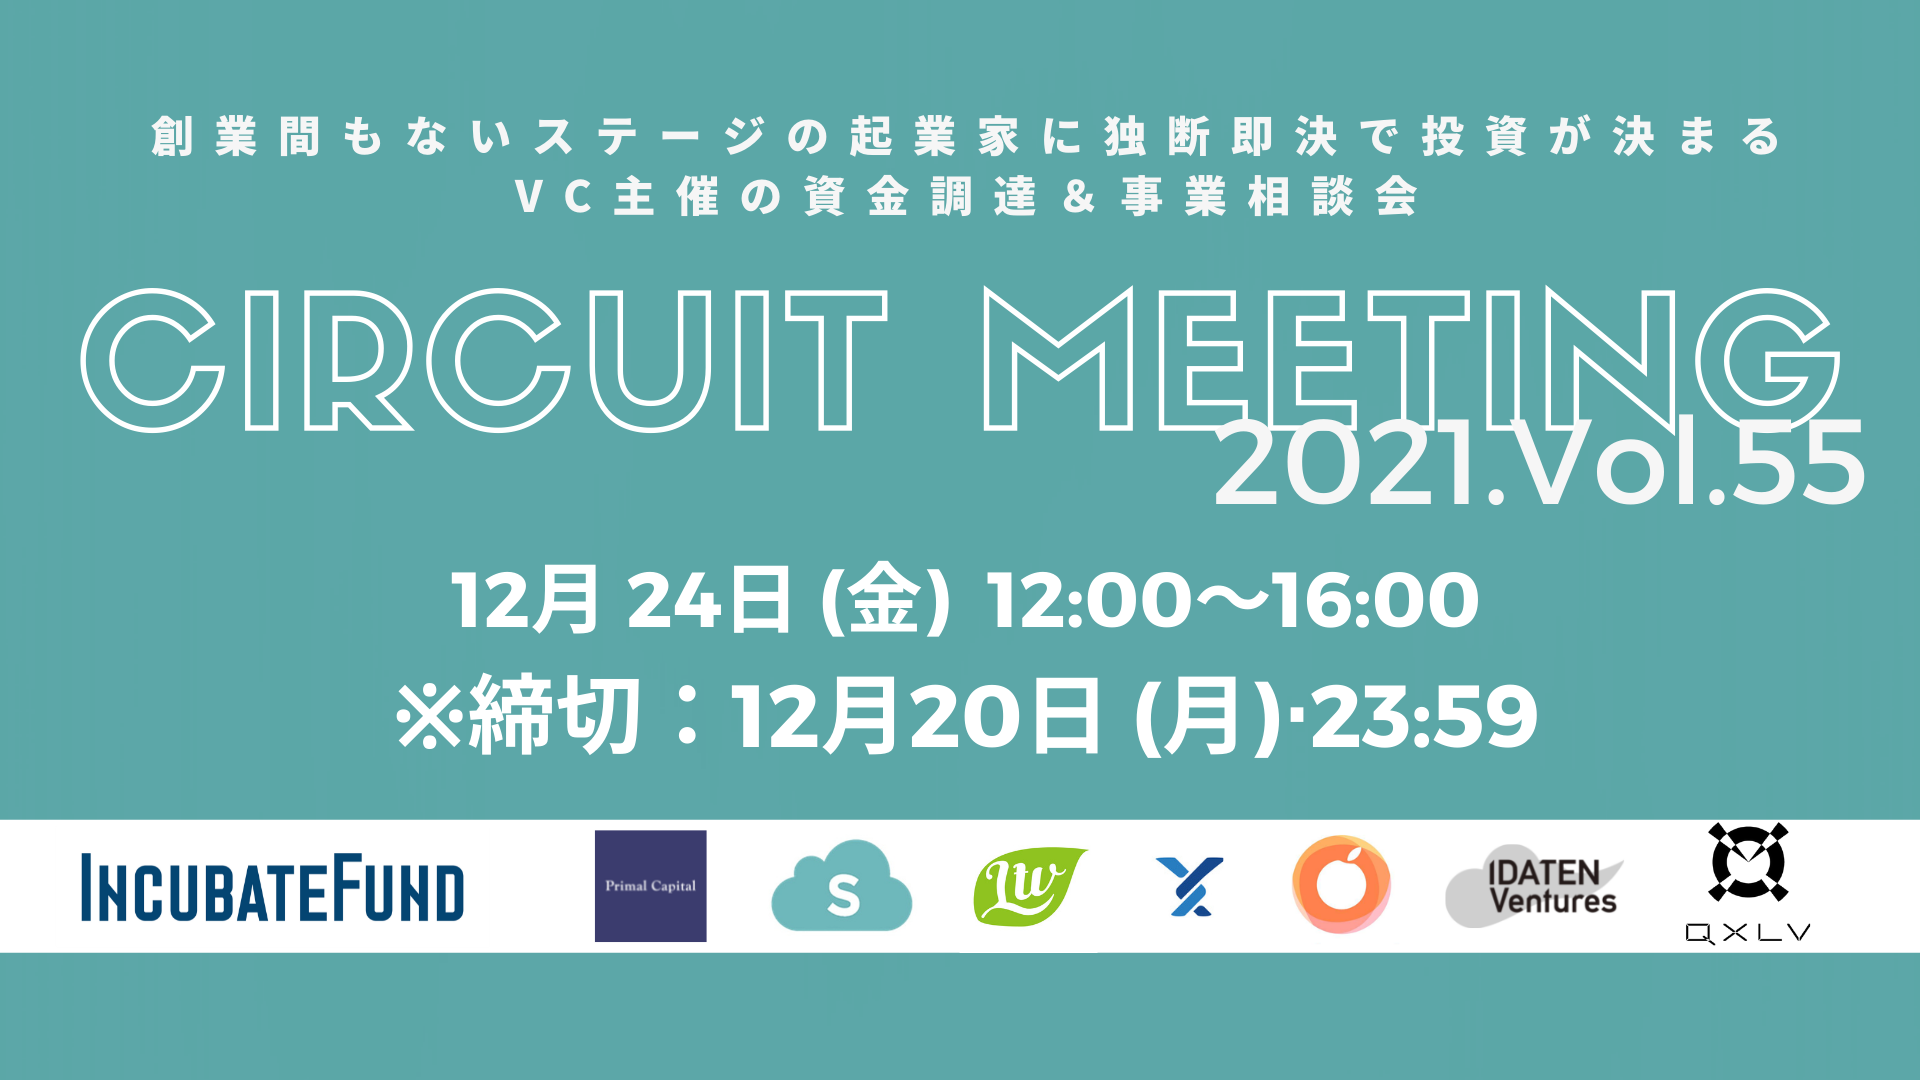 【12/20締切】Circuit Meeting Vol.55